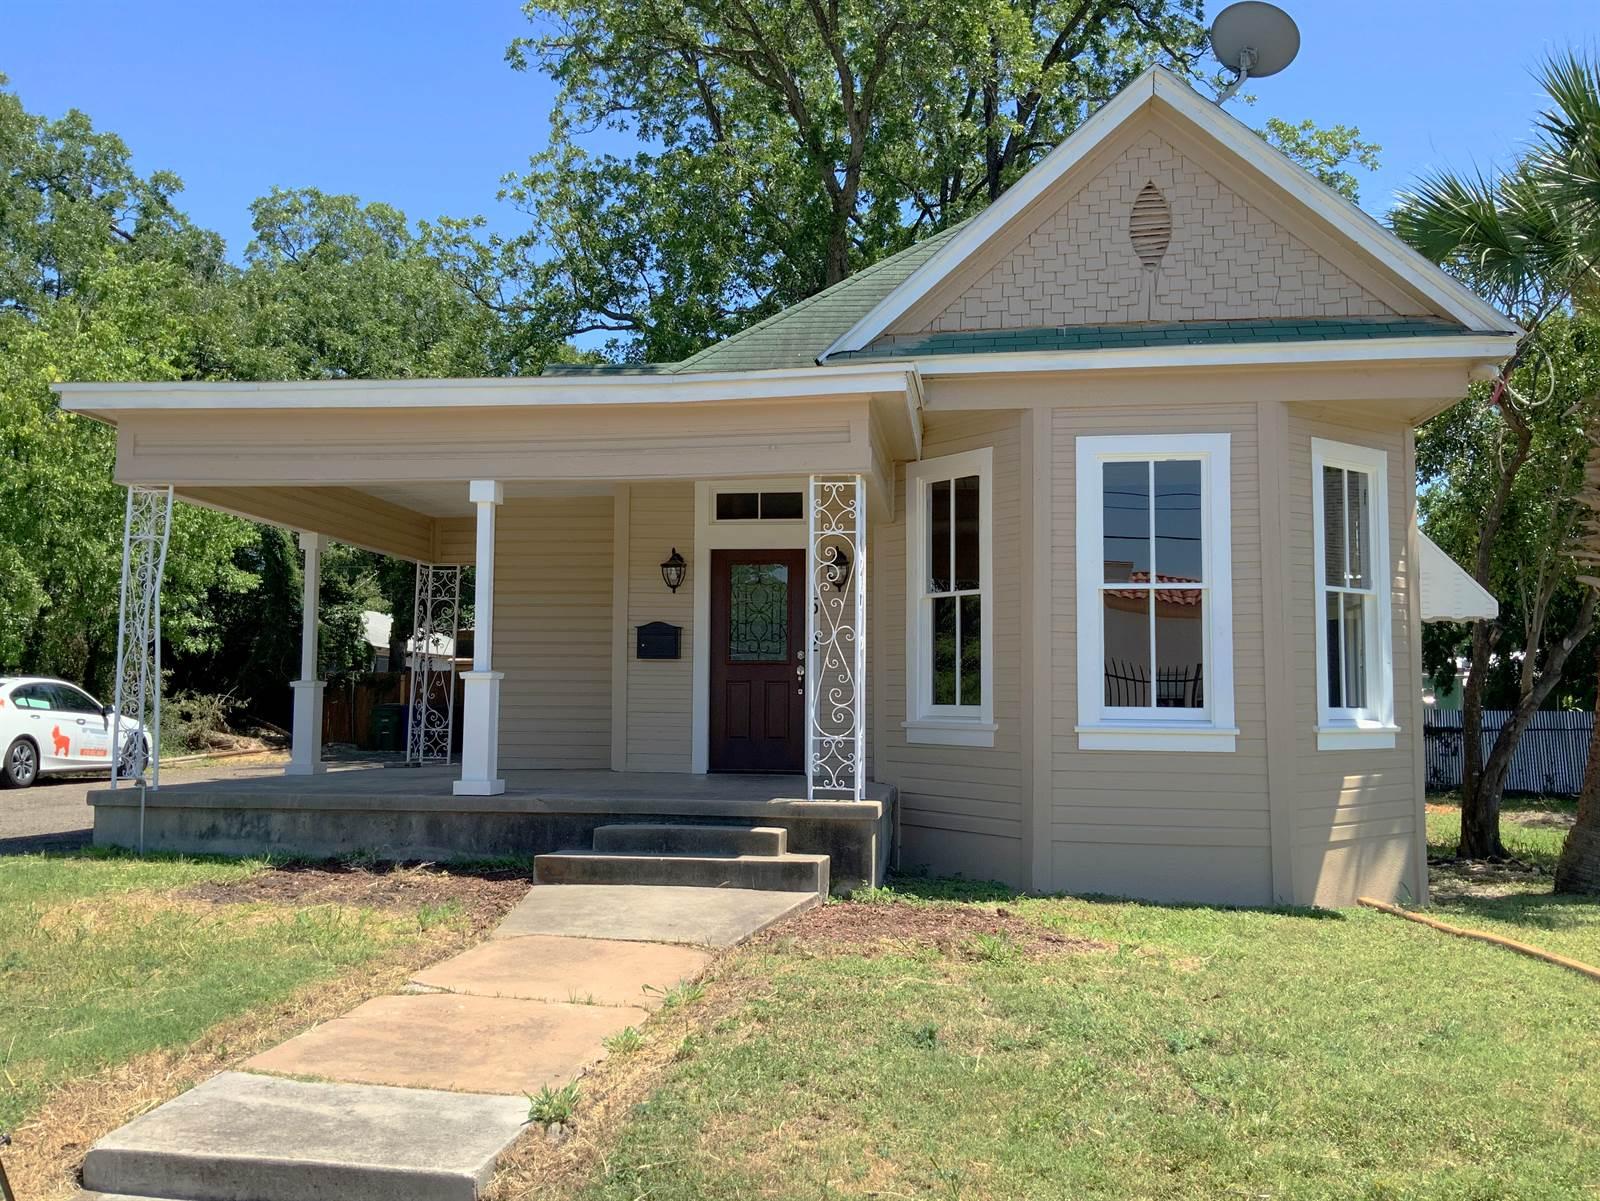 1512 East Houston St, San Antonio, TX 78202